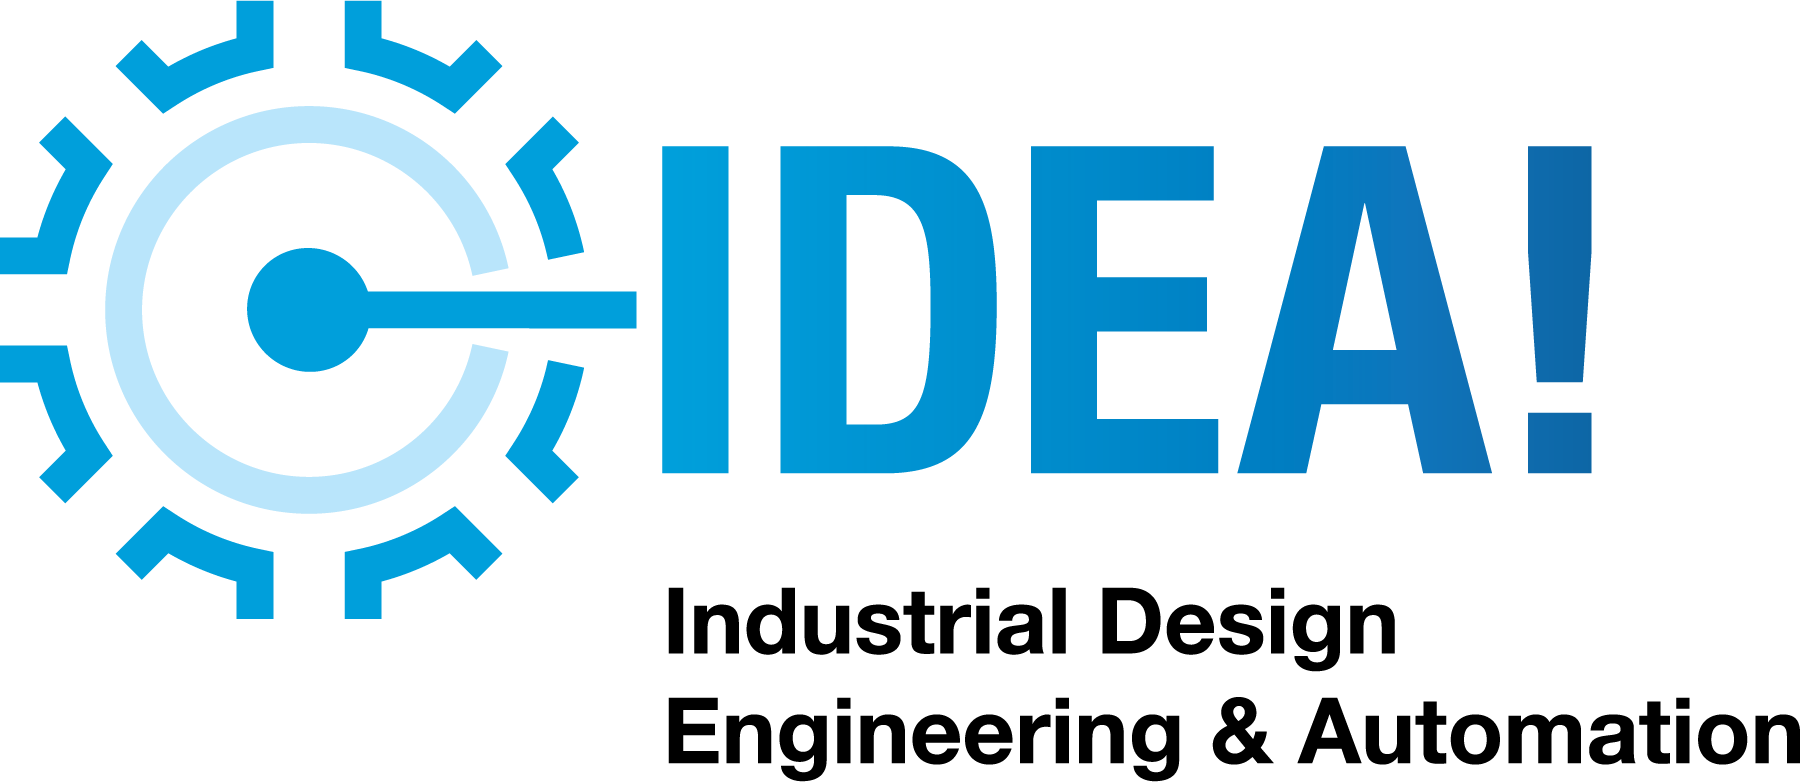 idea_4c